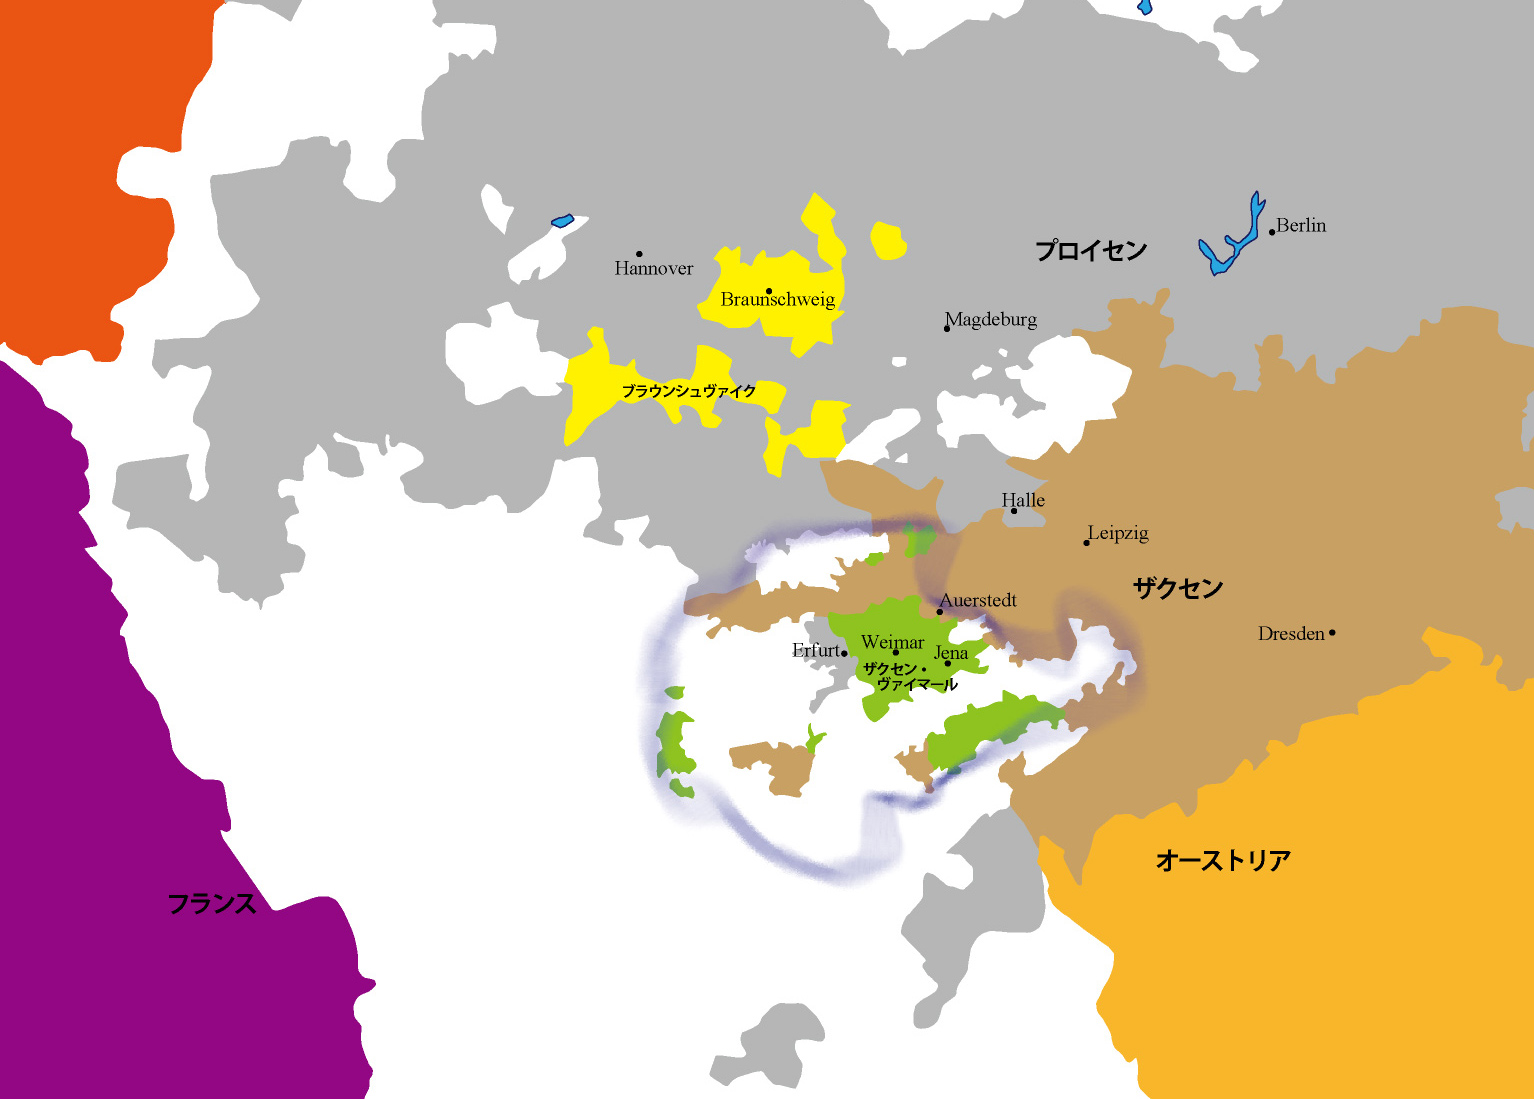 1806_1812Map02ヴァイマル用地図01b